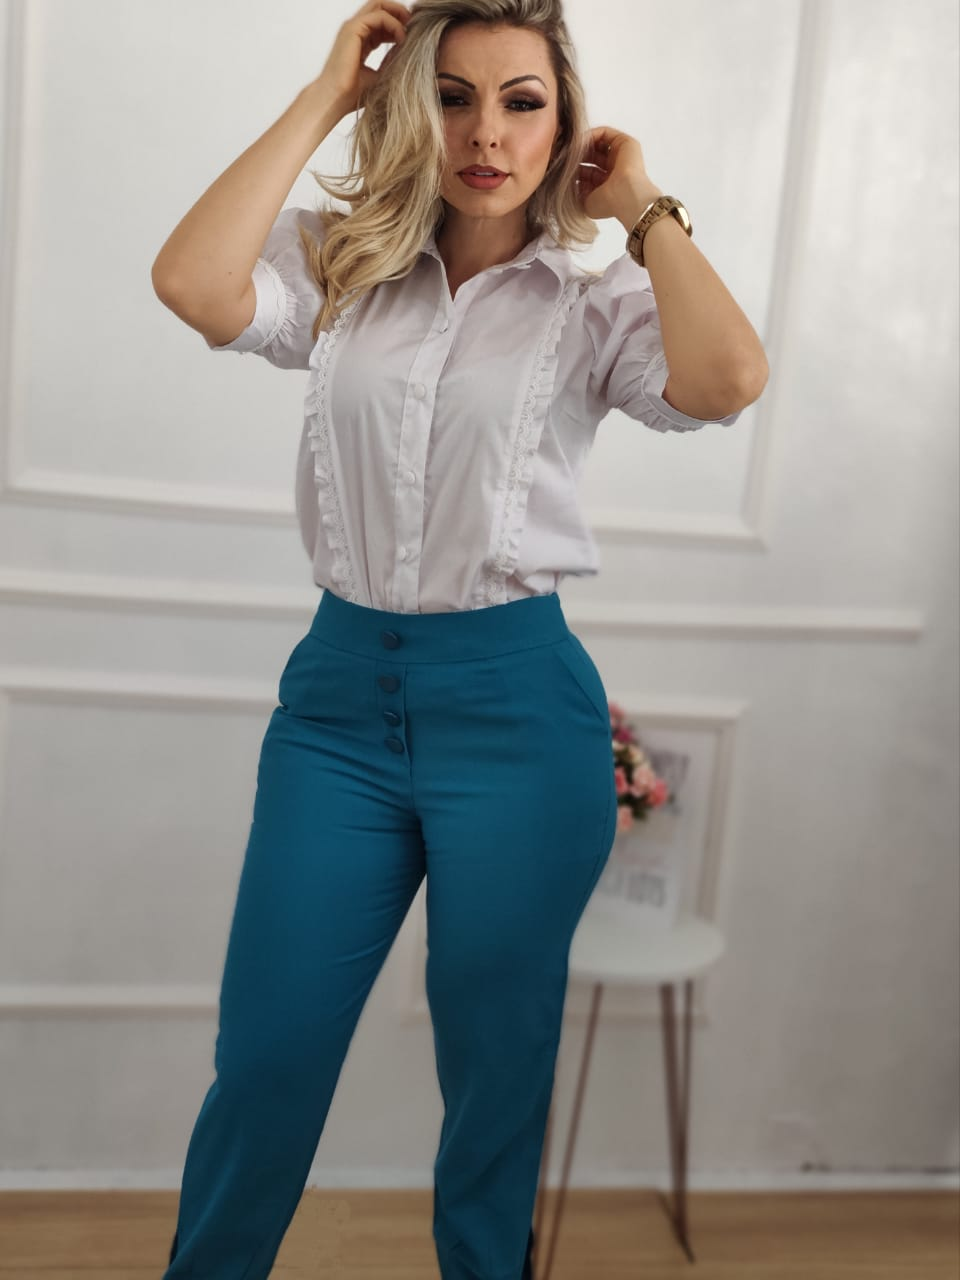 Look: 1 Camisa Manga Curta Bufante Branca + 1 Calça Skinny Laço Azul